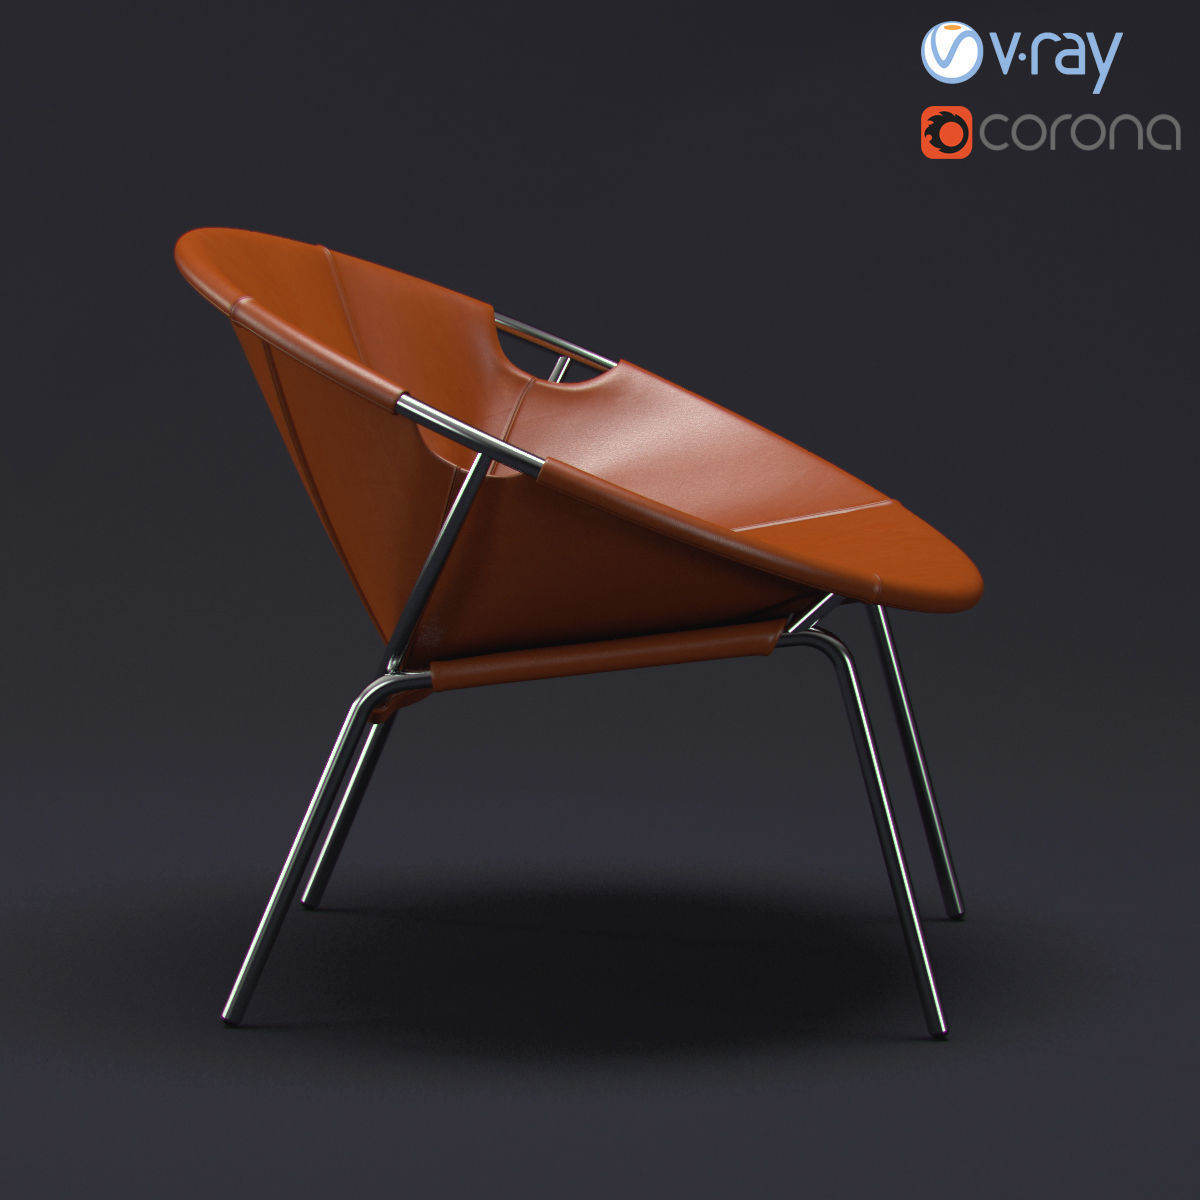 Dries Leather Sling Chair 3d Model Max Obj Fbx Mtl 4